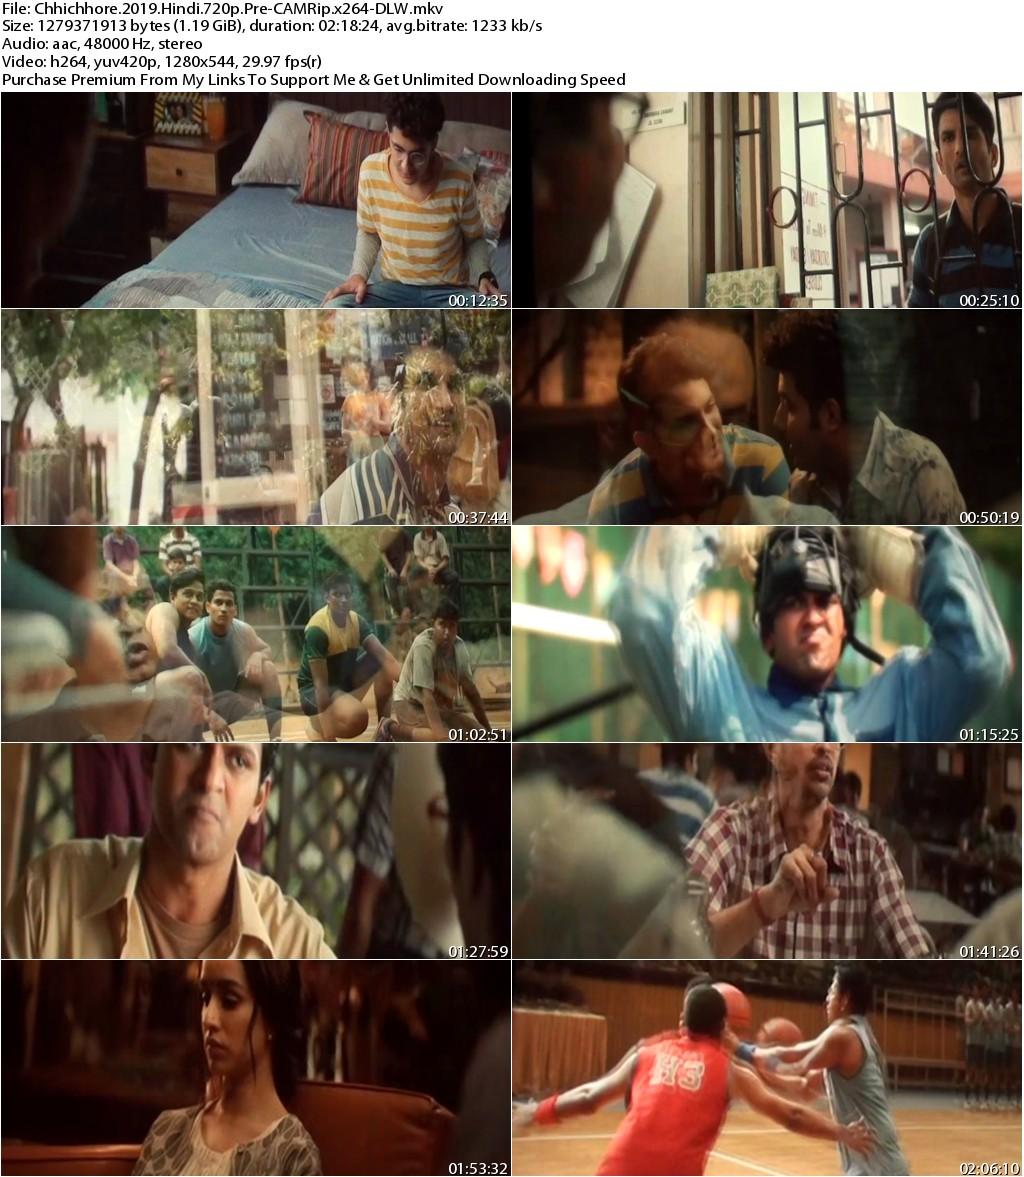 Chhichhore (2019) Hindi 720p Pre-CAMRip x264-DLW